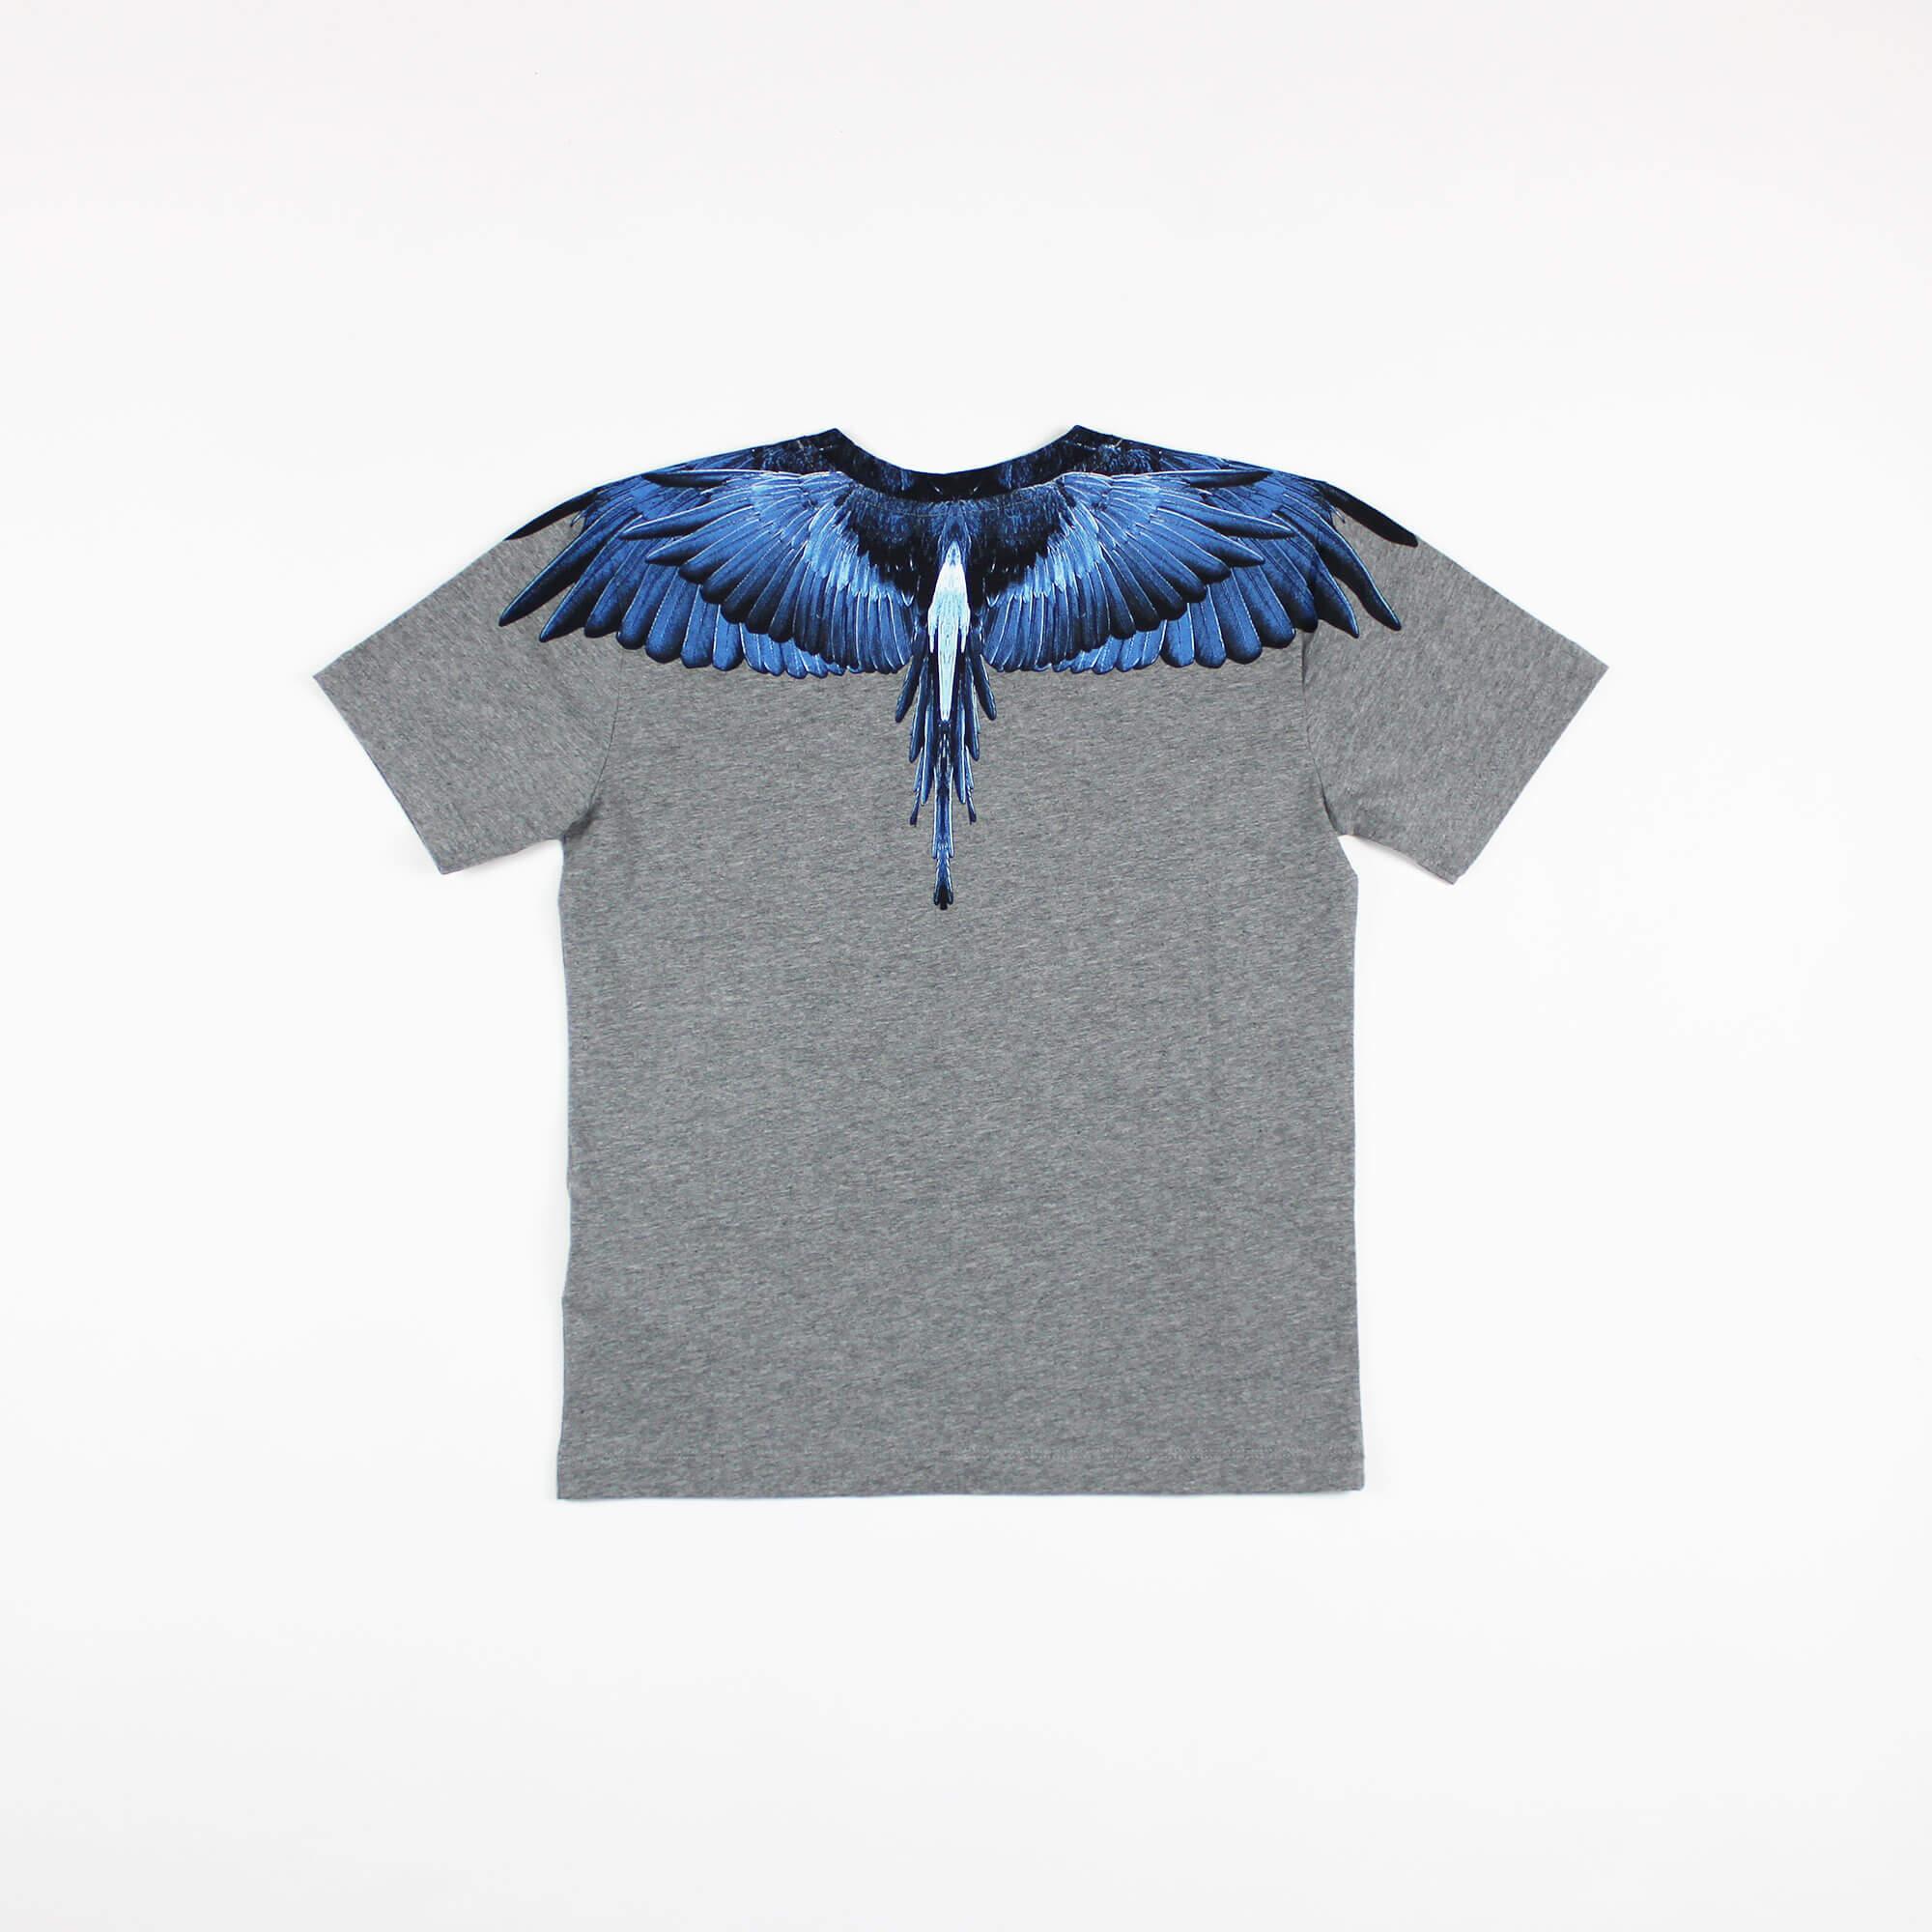 T-shirt blue wings - Grigio